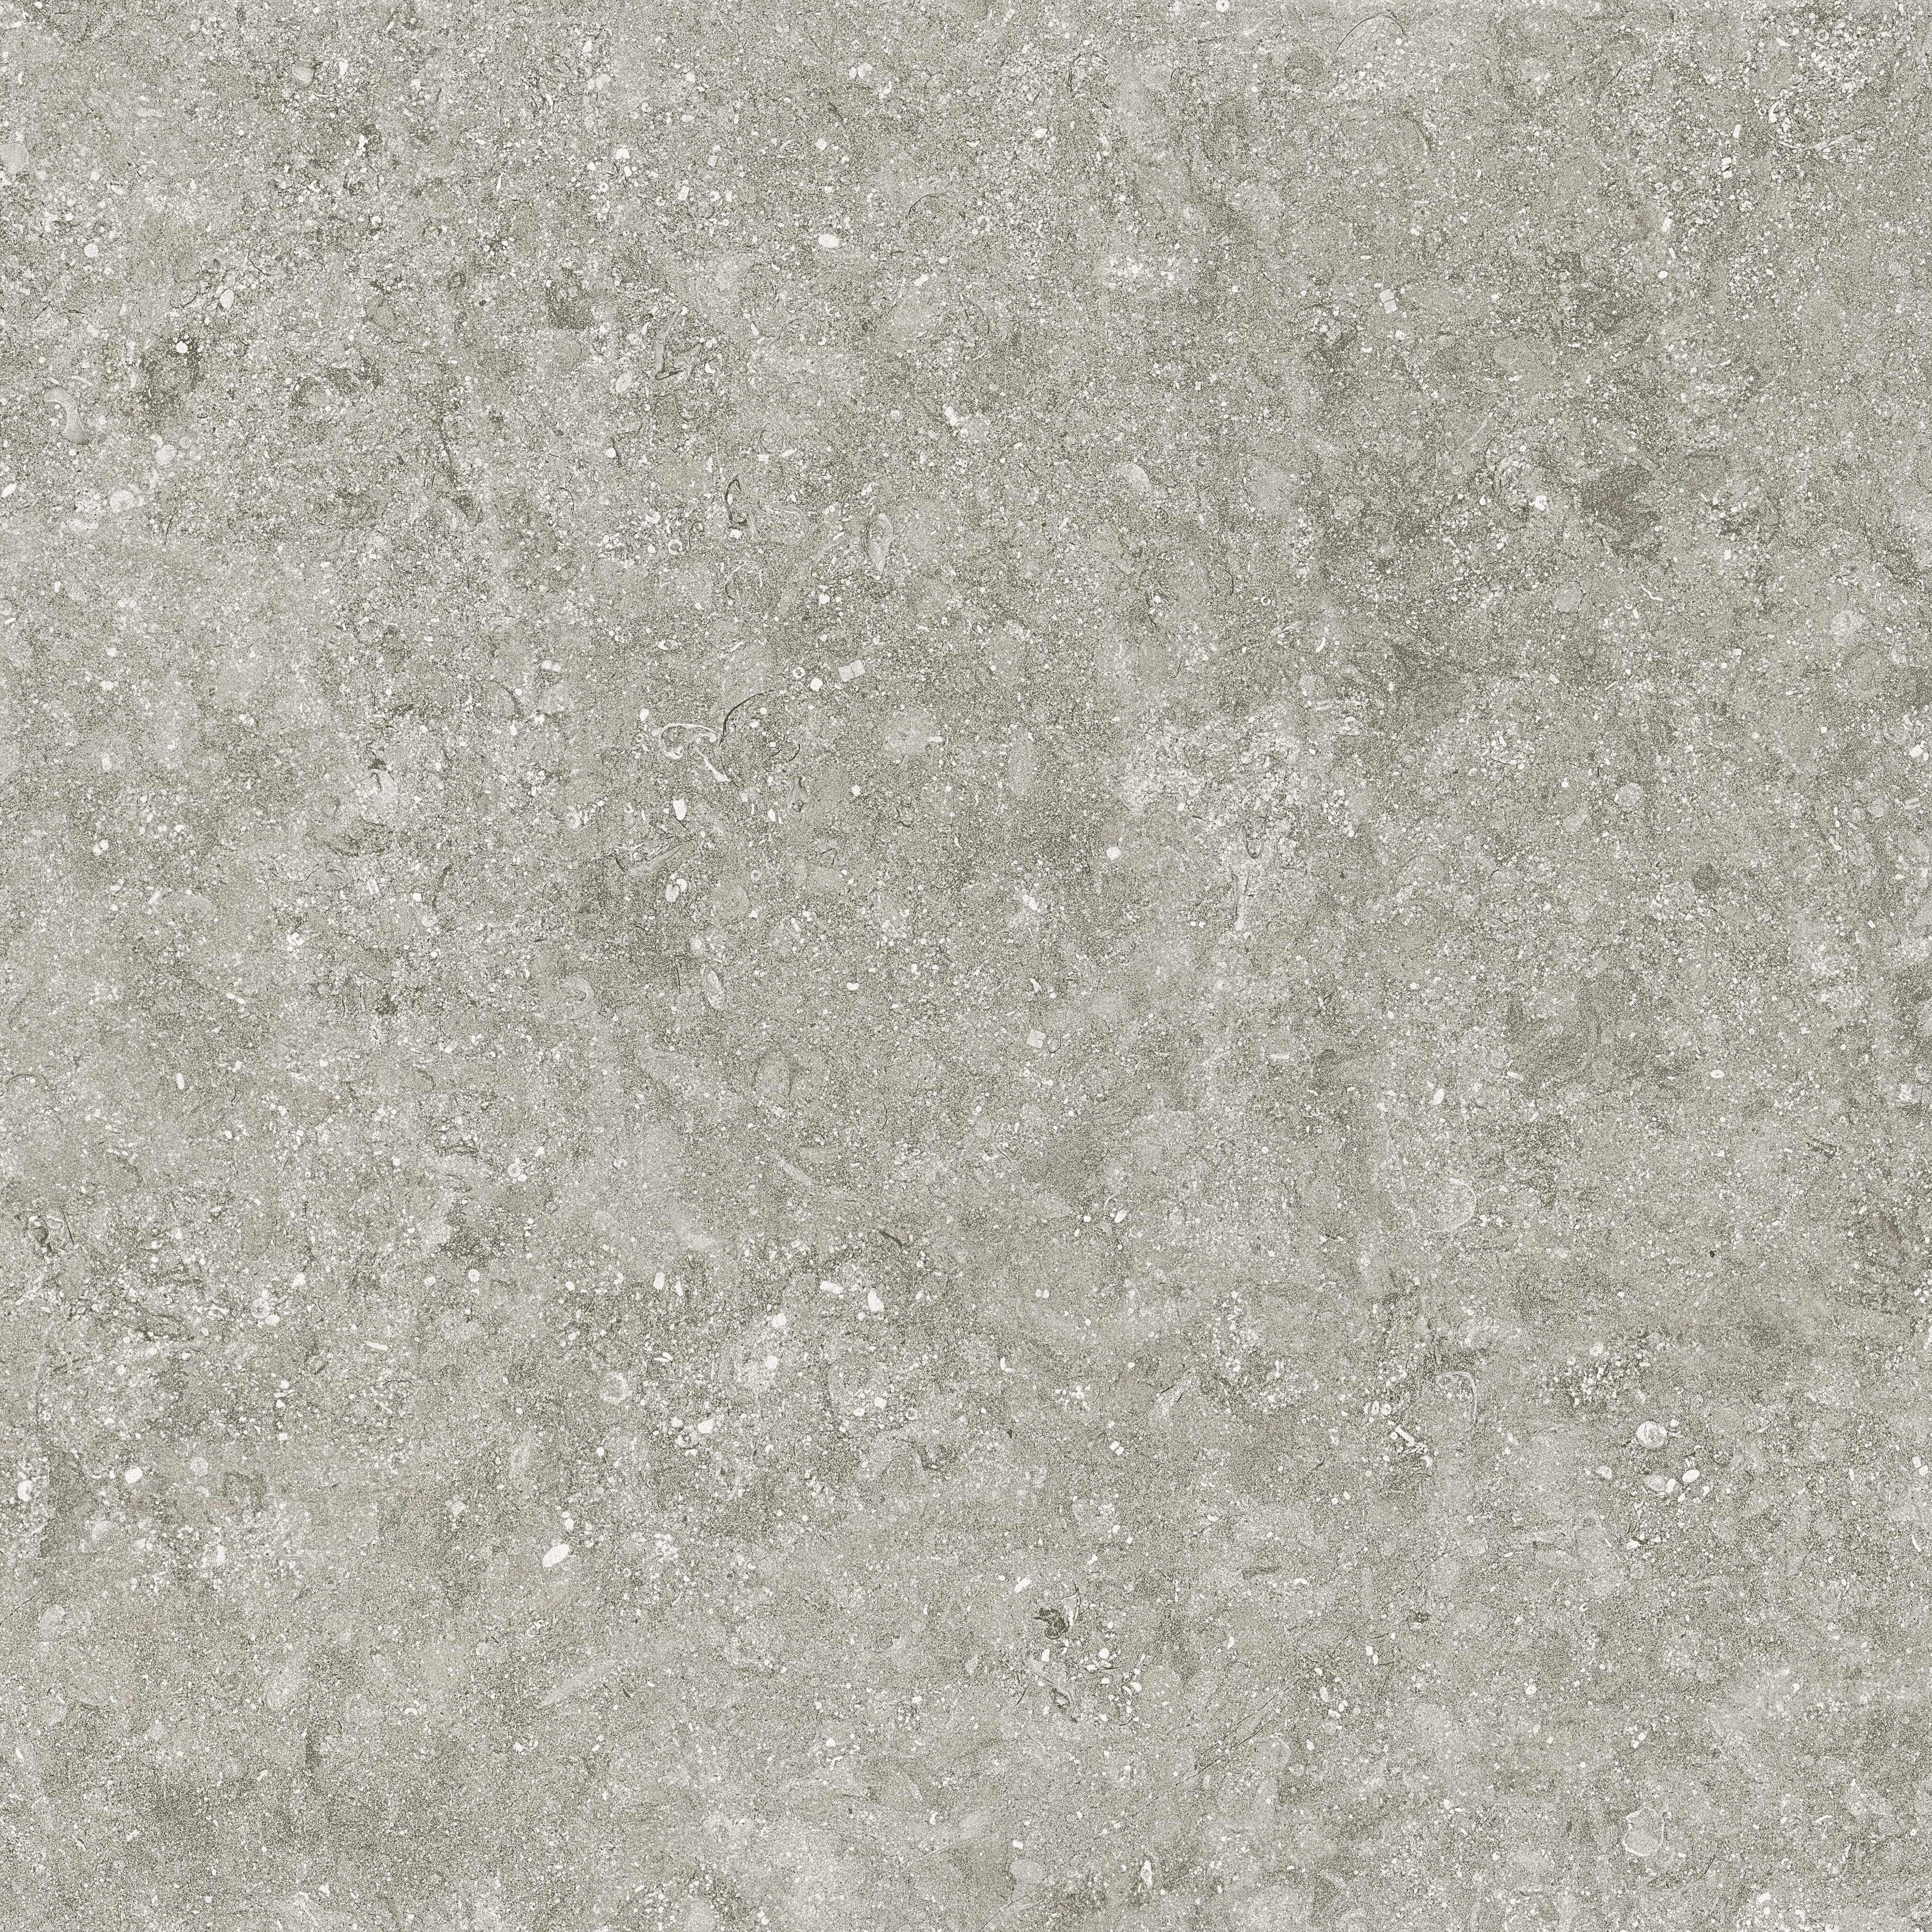 78bs33e bluestone gris e1 100×100 3 rgb